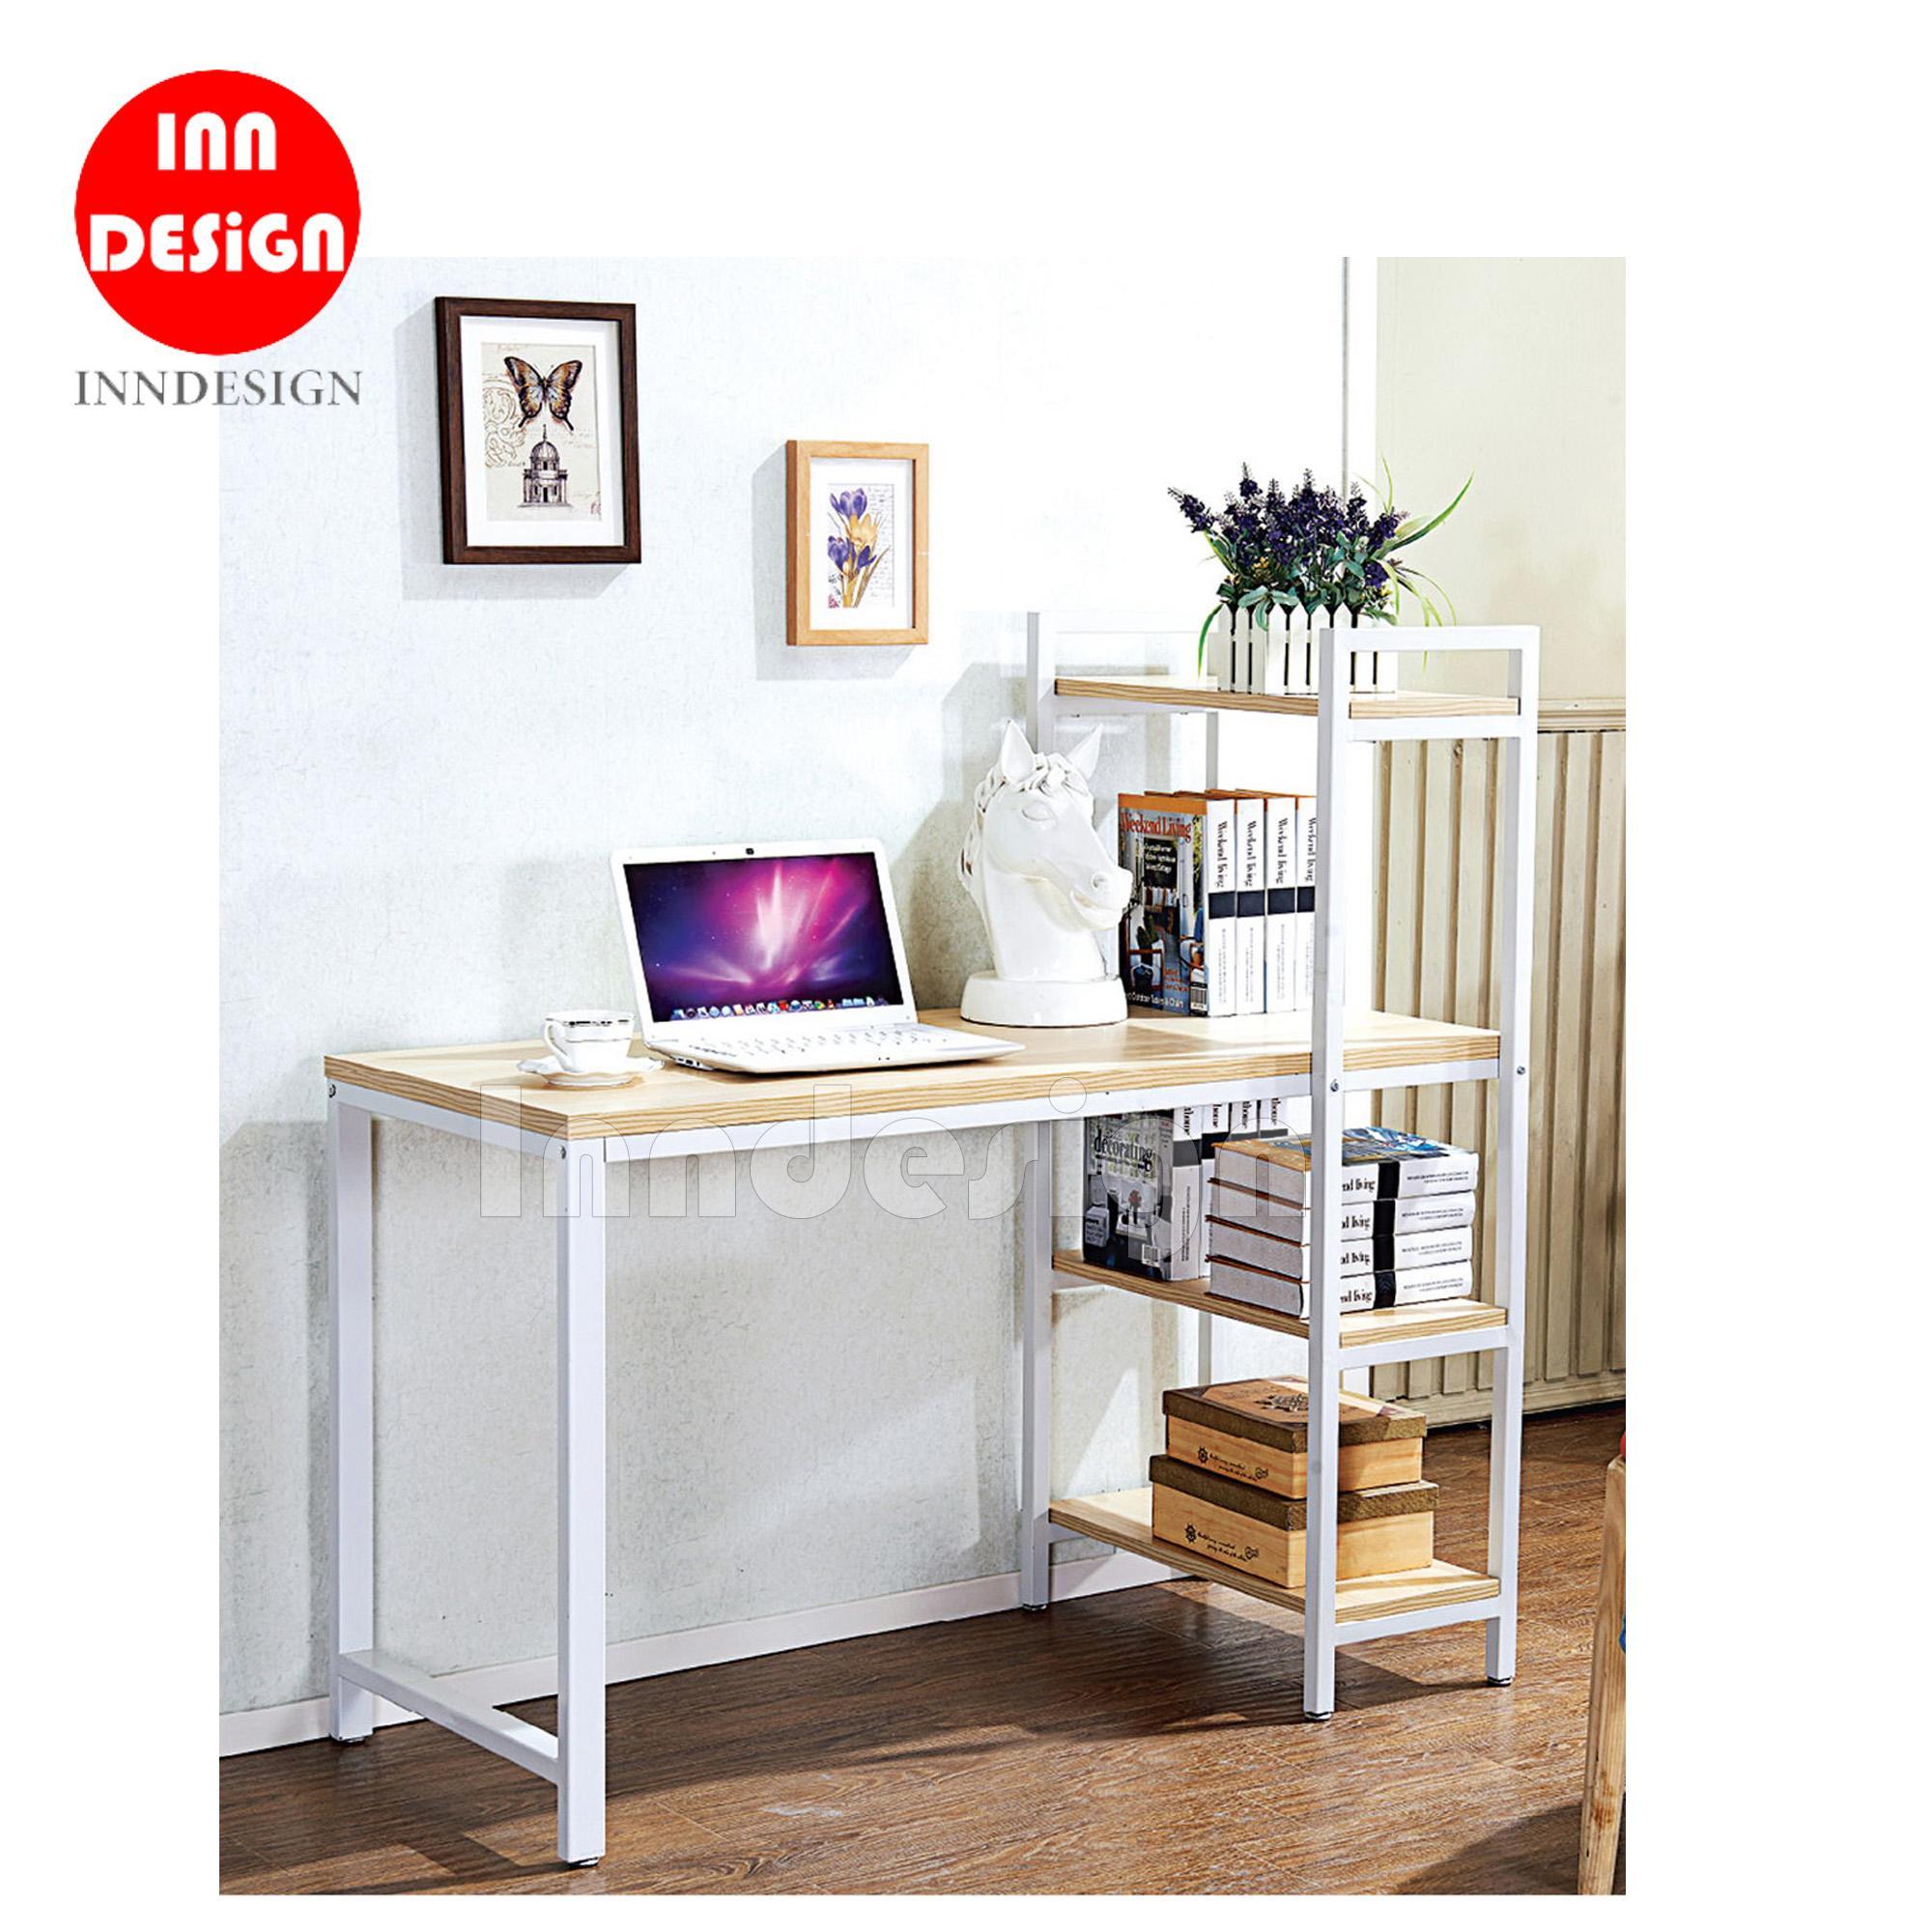 Ken Study Table with Shelf